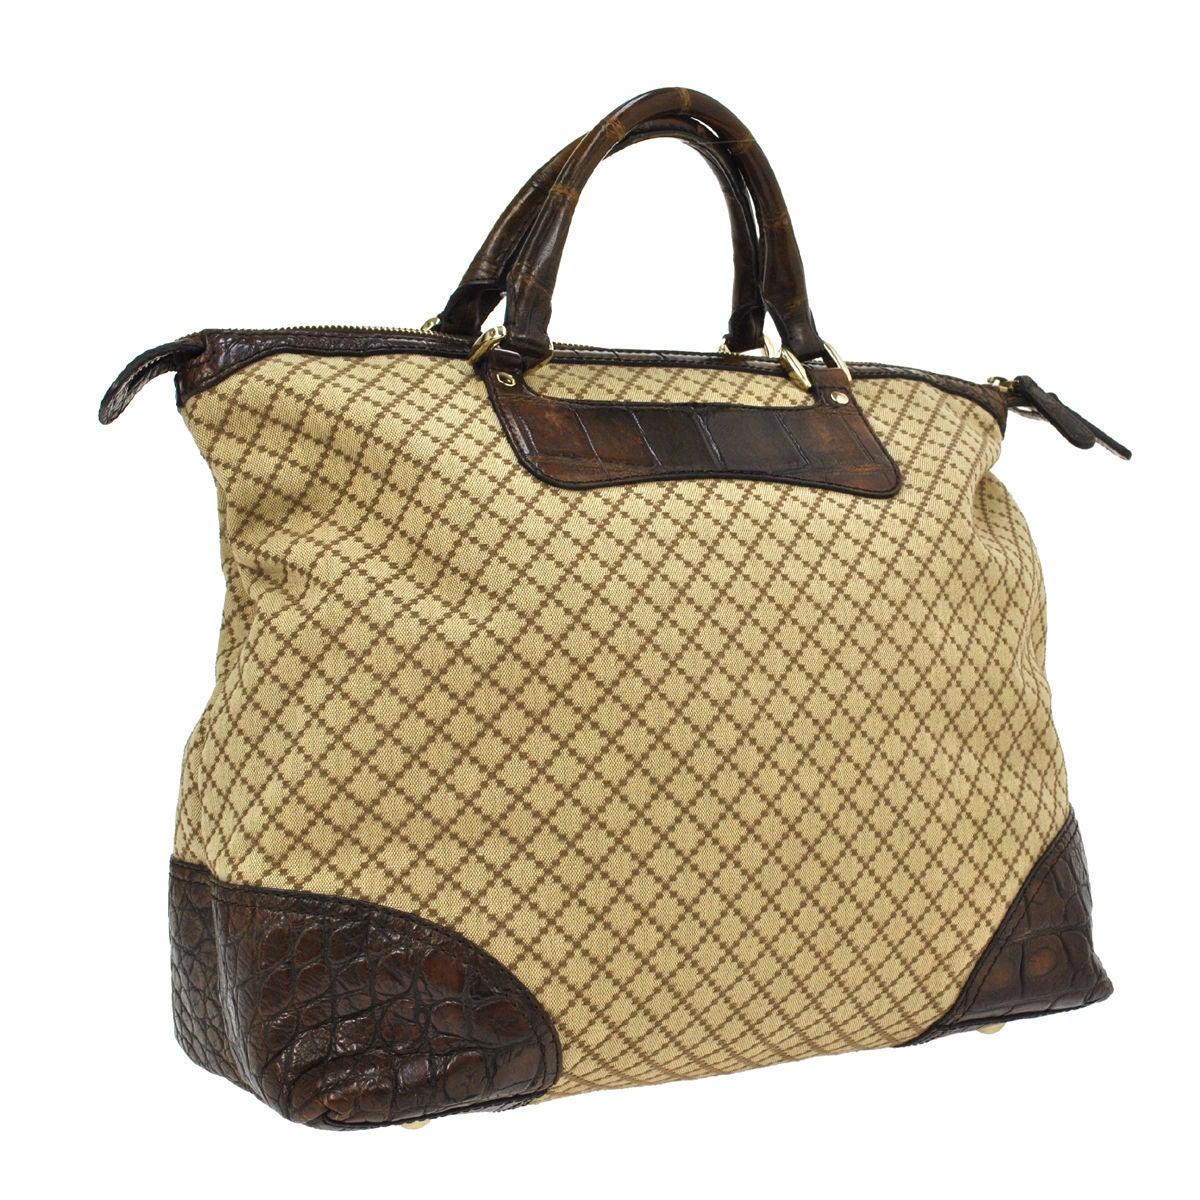 06dfb9d2133613 Gucci Monogram Canvas Men's Weekender Crocodile Carryall Satchel Tote Bag  at 1stdibs